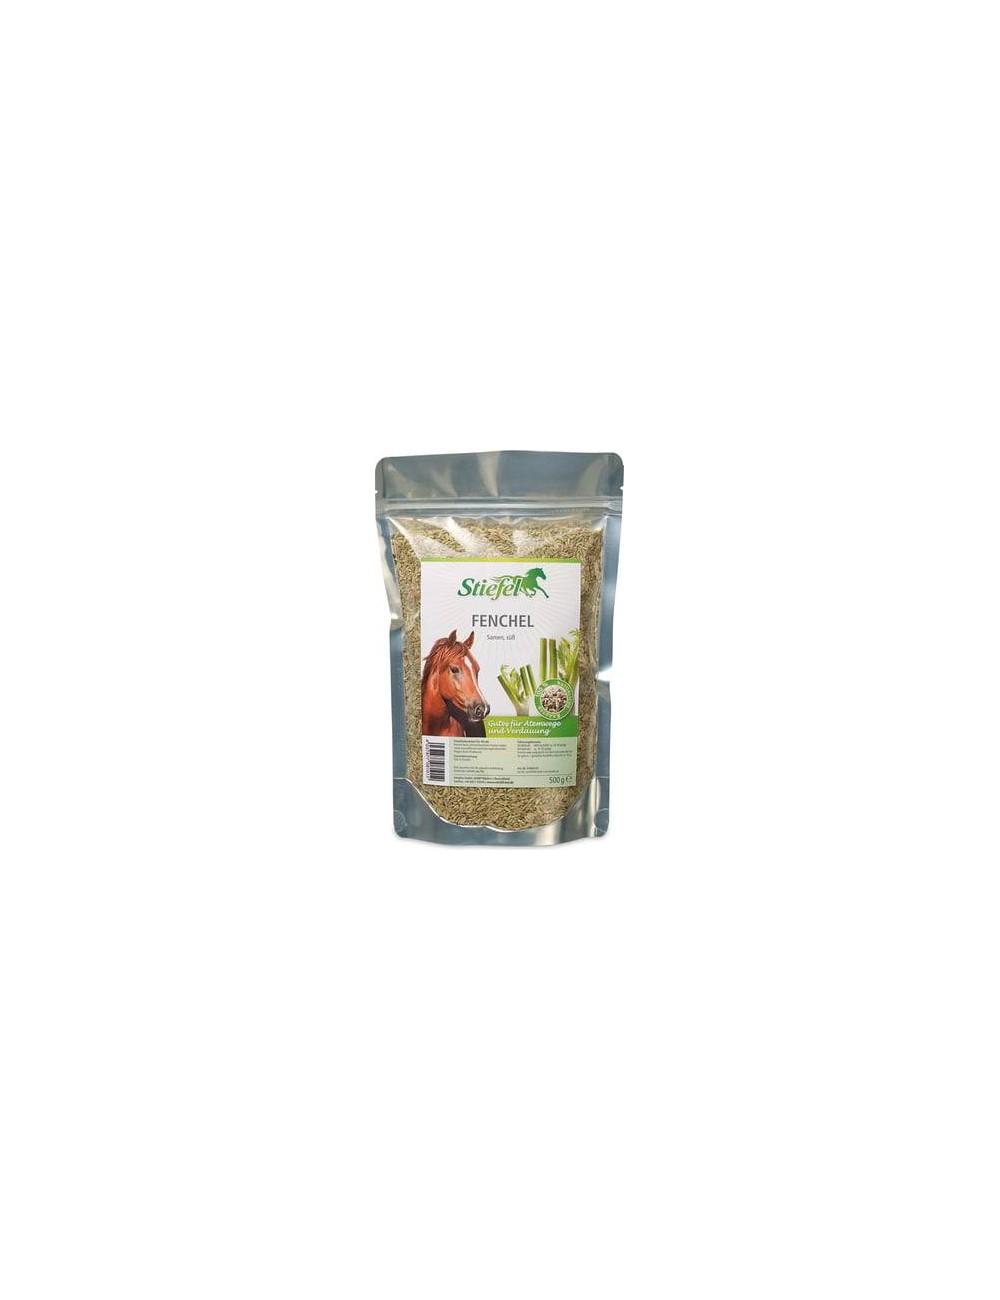 Stiefel Fenchel , Samen süß